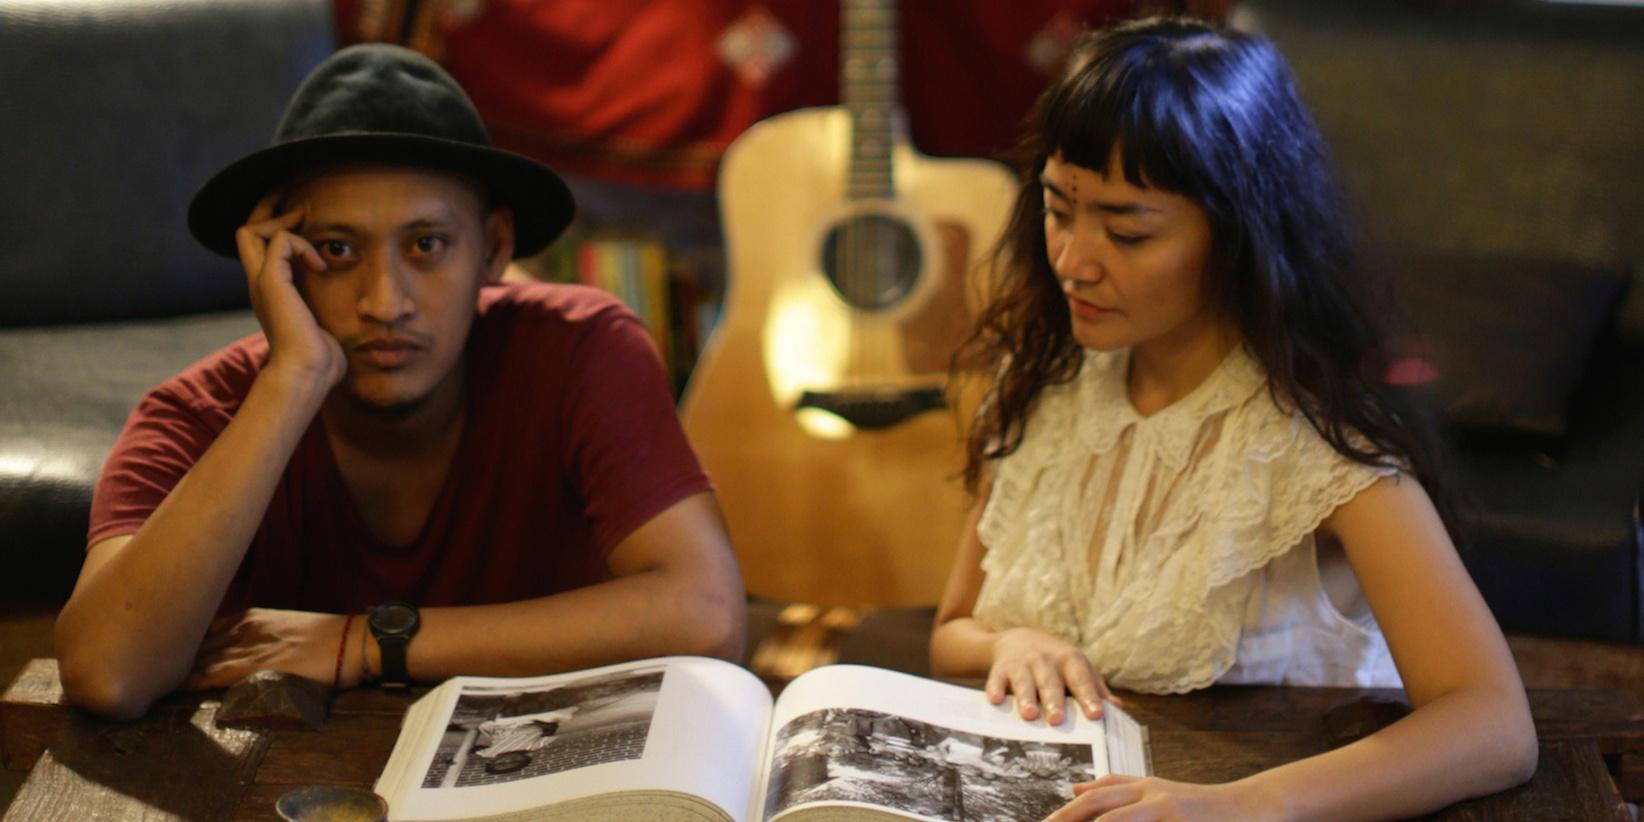 Yogyakarta based duo Stars and Rabbit announce Baby Eyes Asia Tour dates